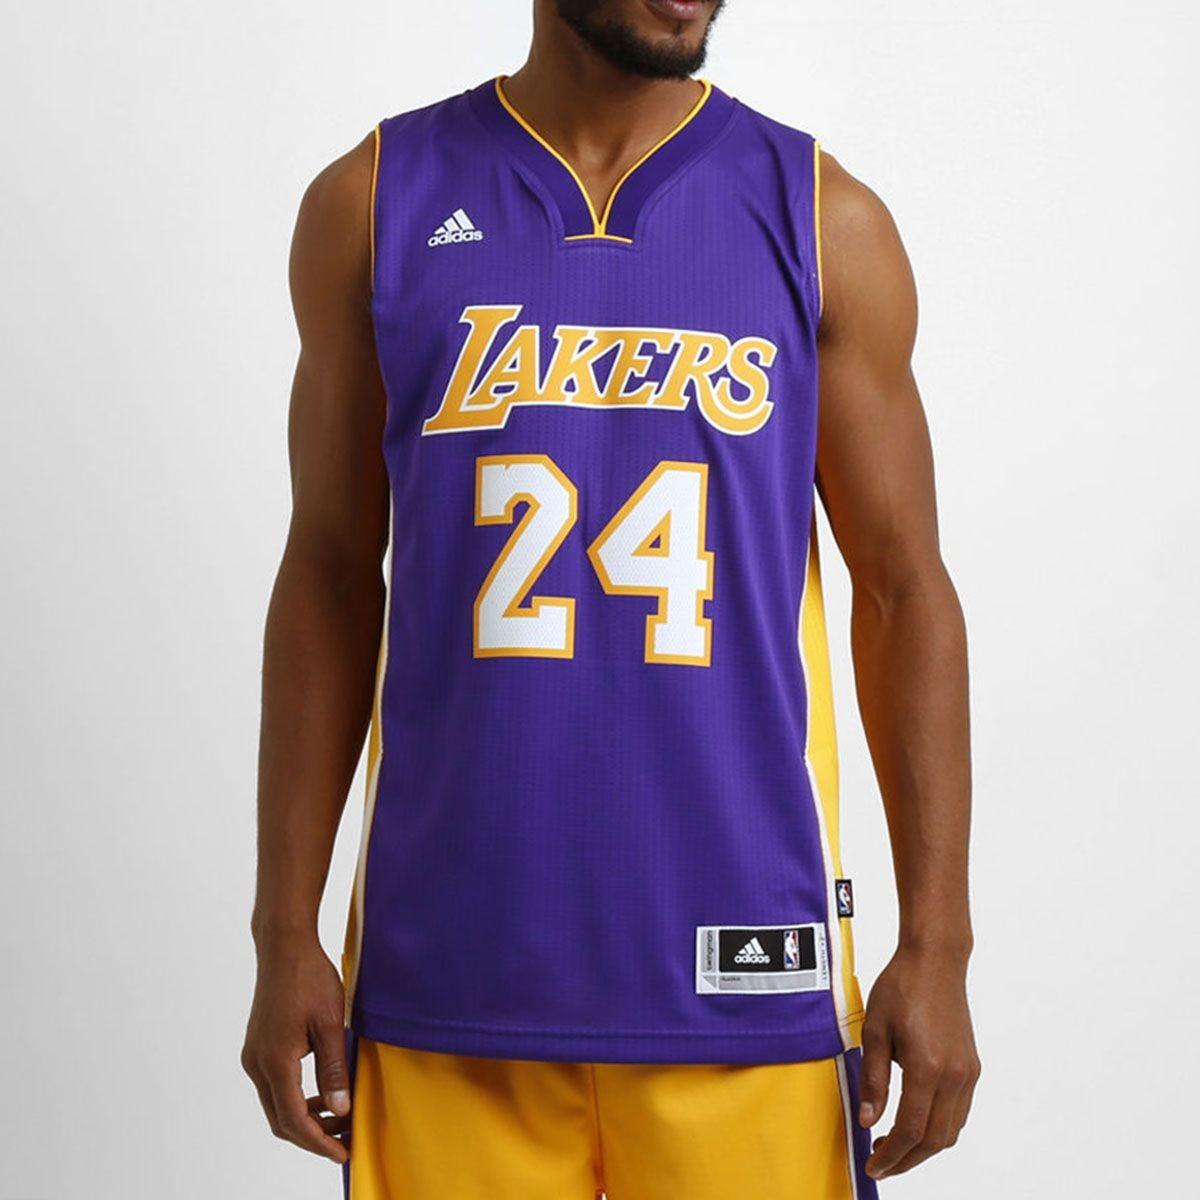 the best attitude f2fb5 75451 Camisa adidas Nba Swingman Los Angeles Lakers 24 Kobe Briant